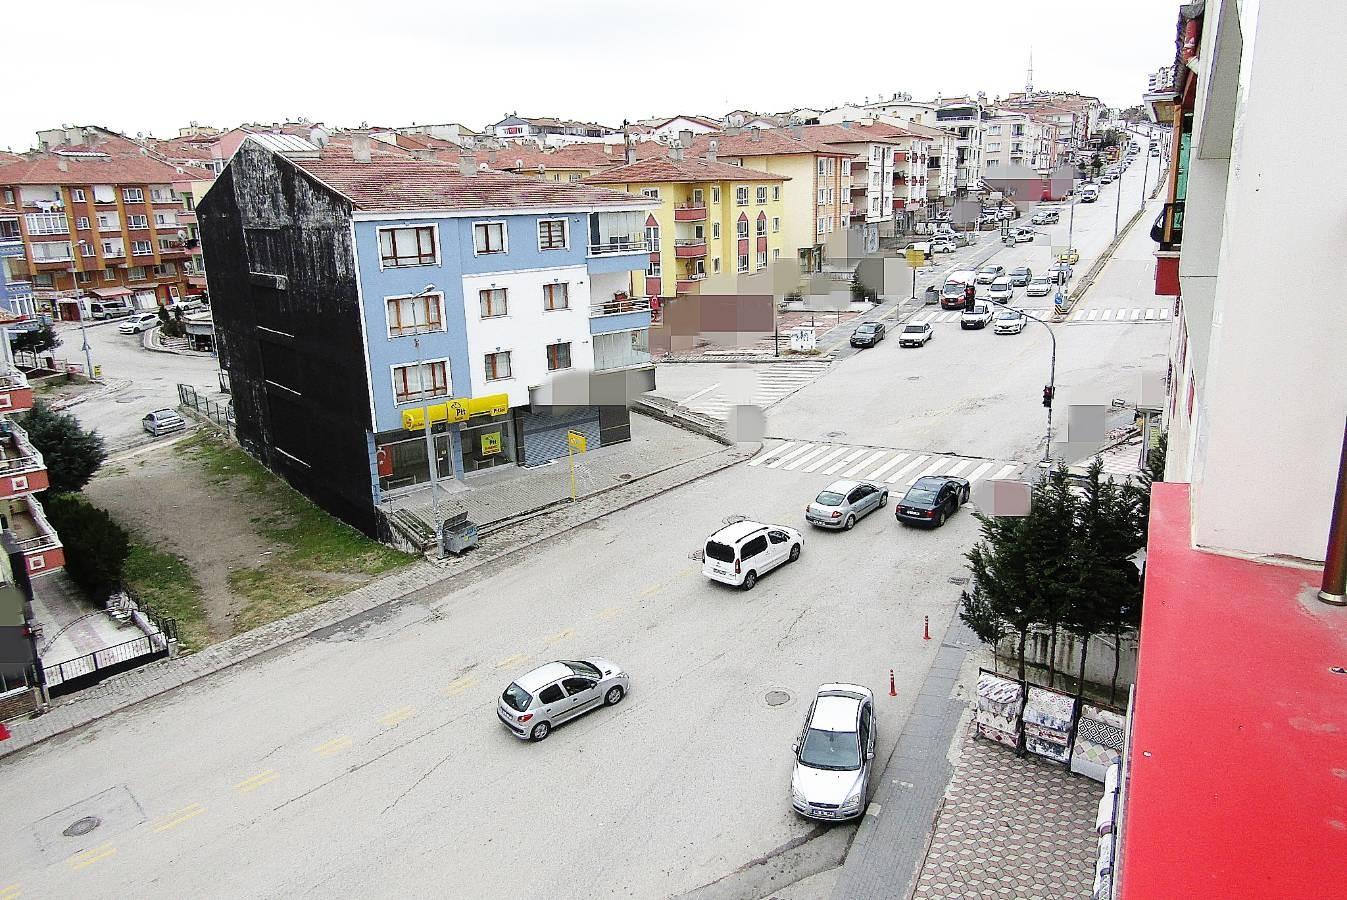 SR EMLAK'TAN K.KARABEKİR MAH'DE 1200m² KÖŞE BAŞI KİRALIK PLAZA